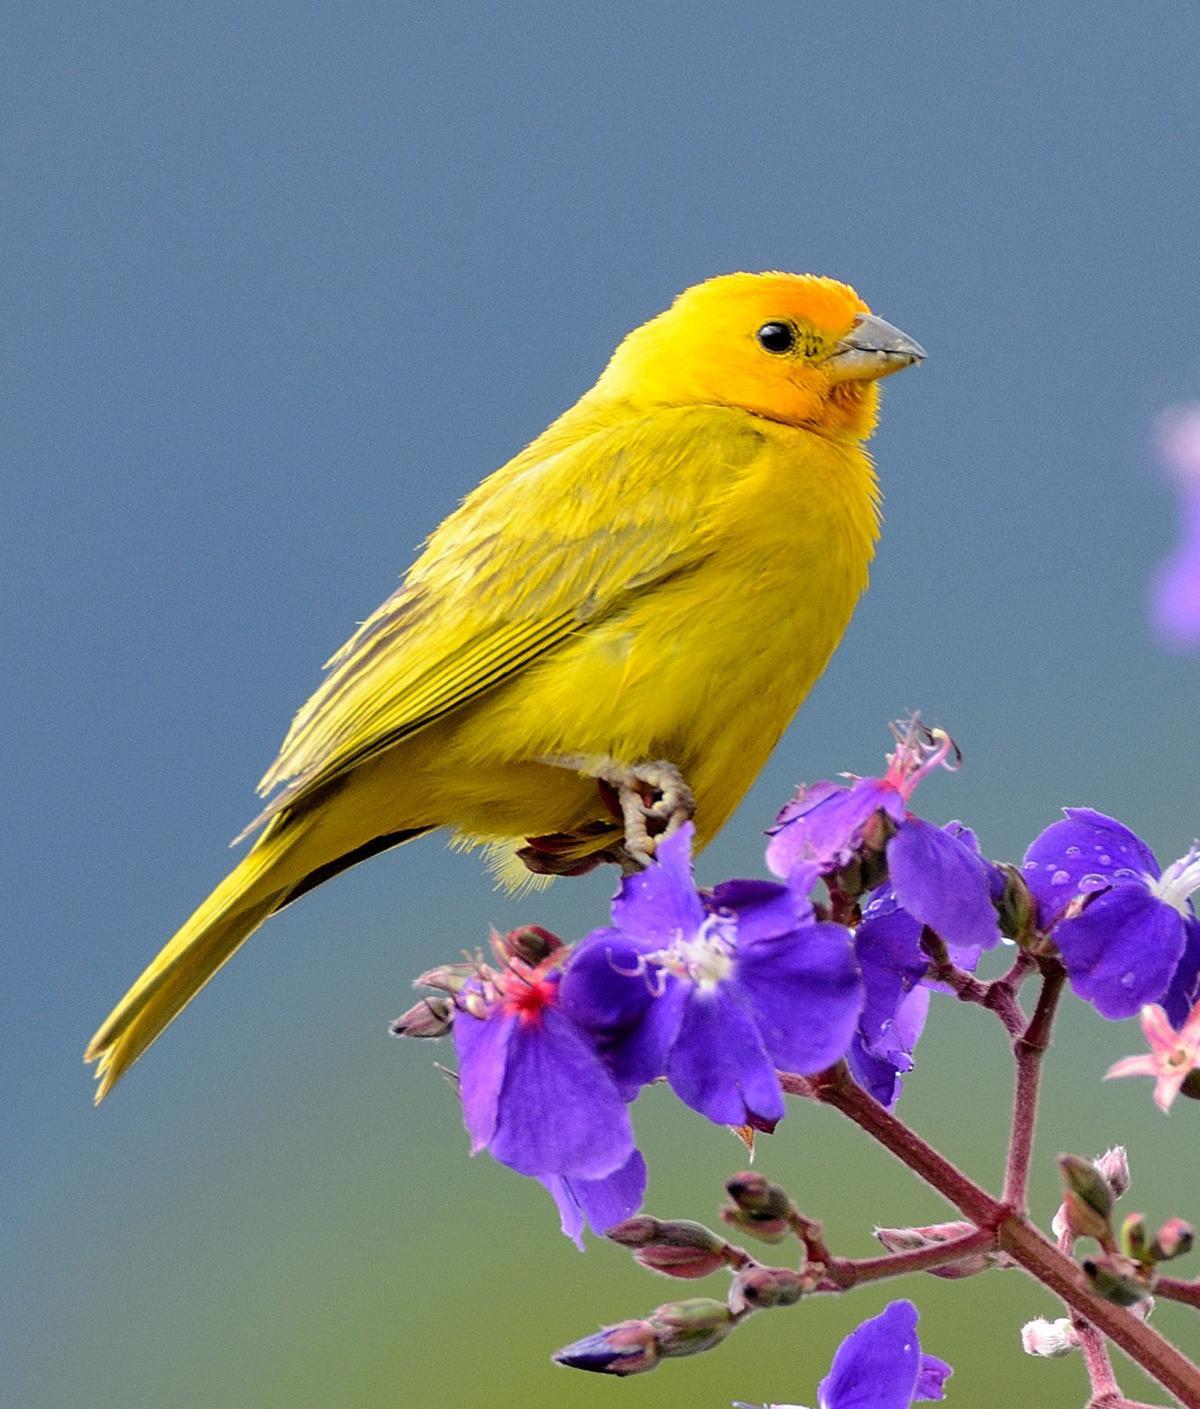 saffron finch by Arley Vargas.jpg